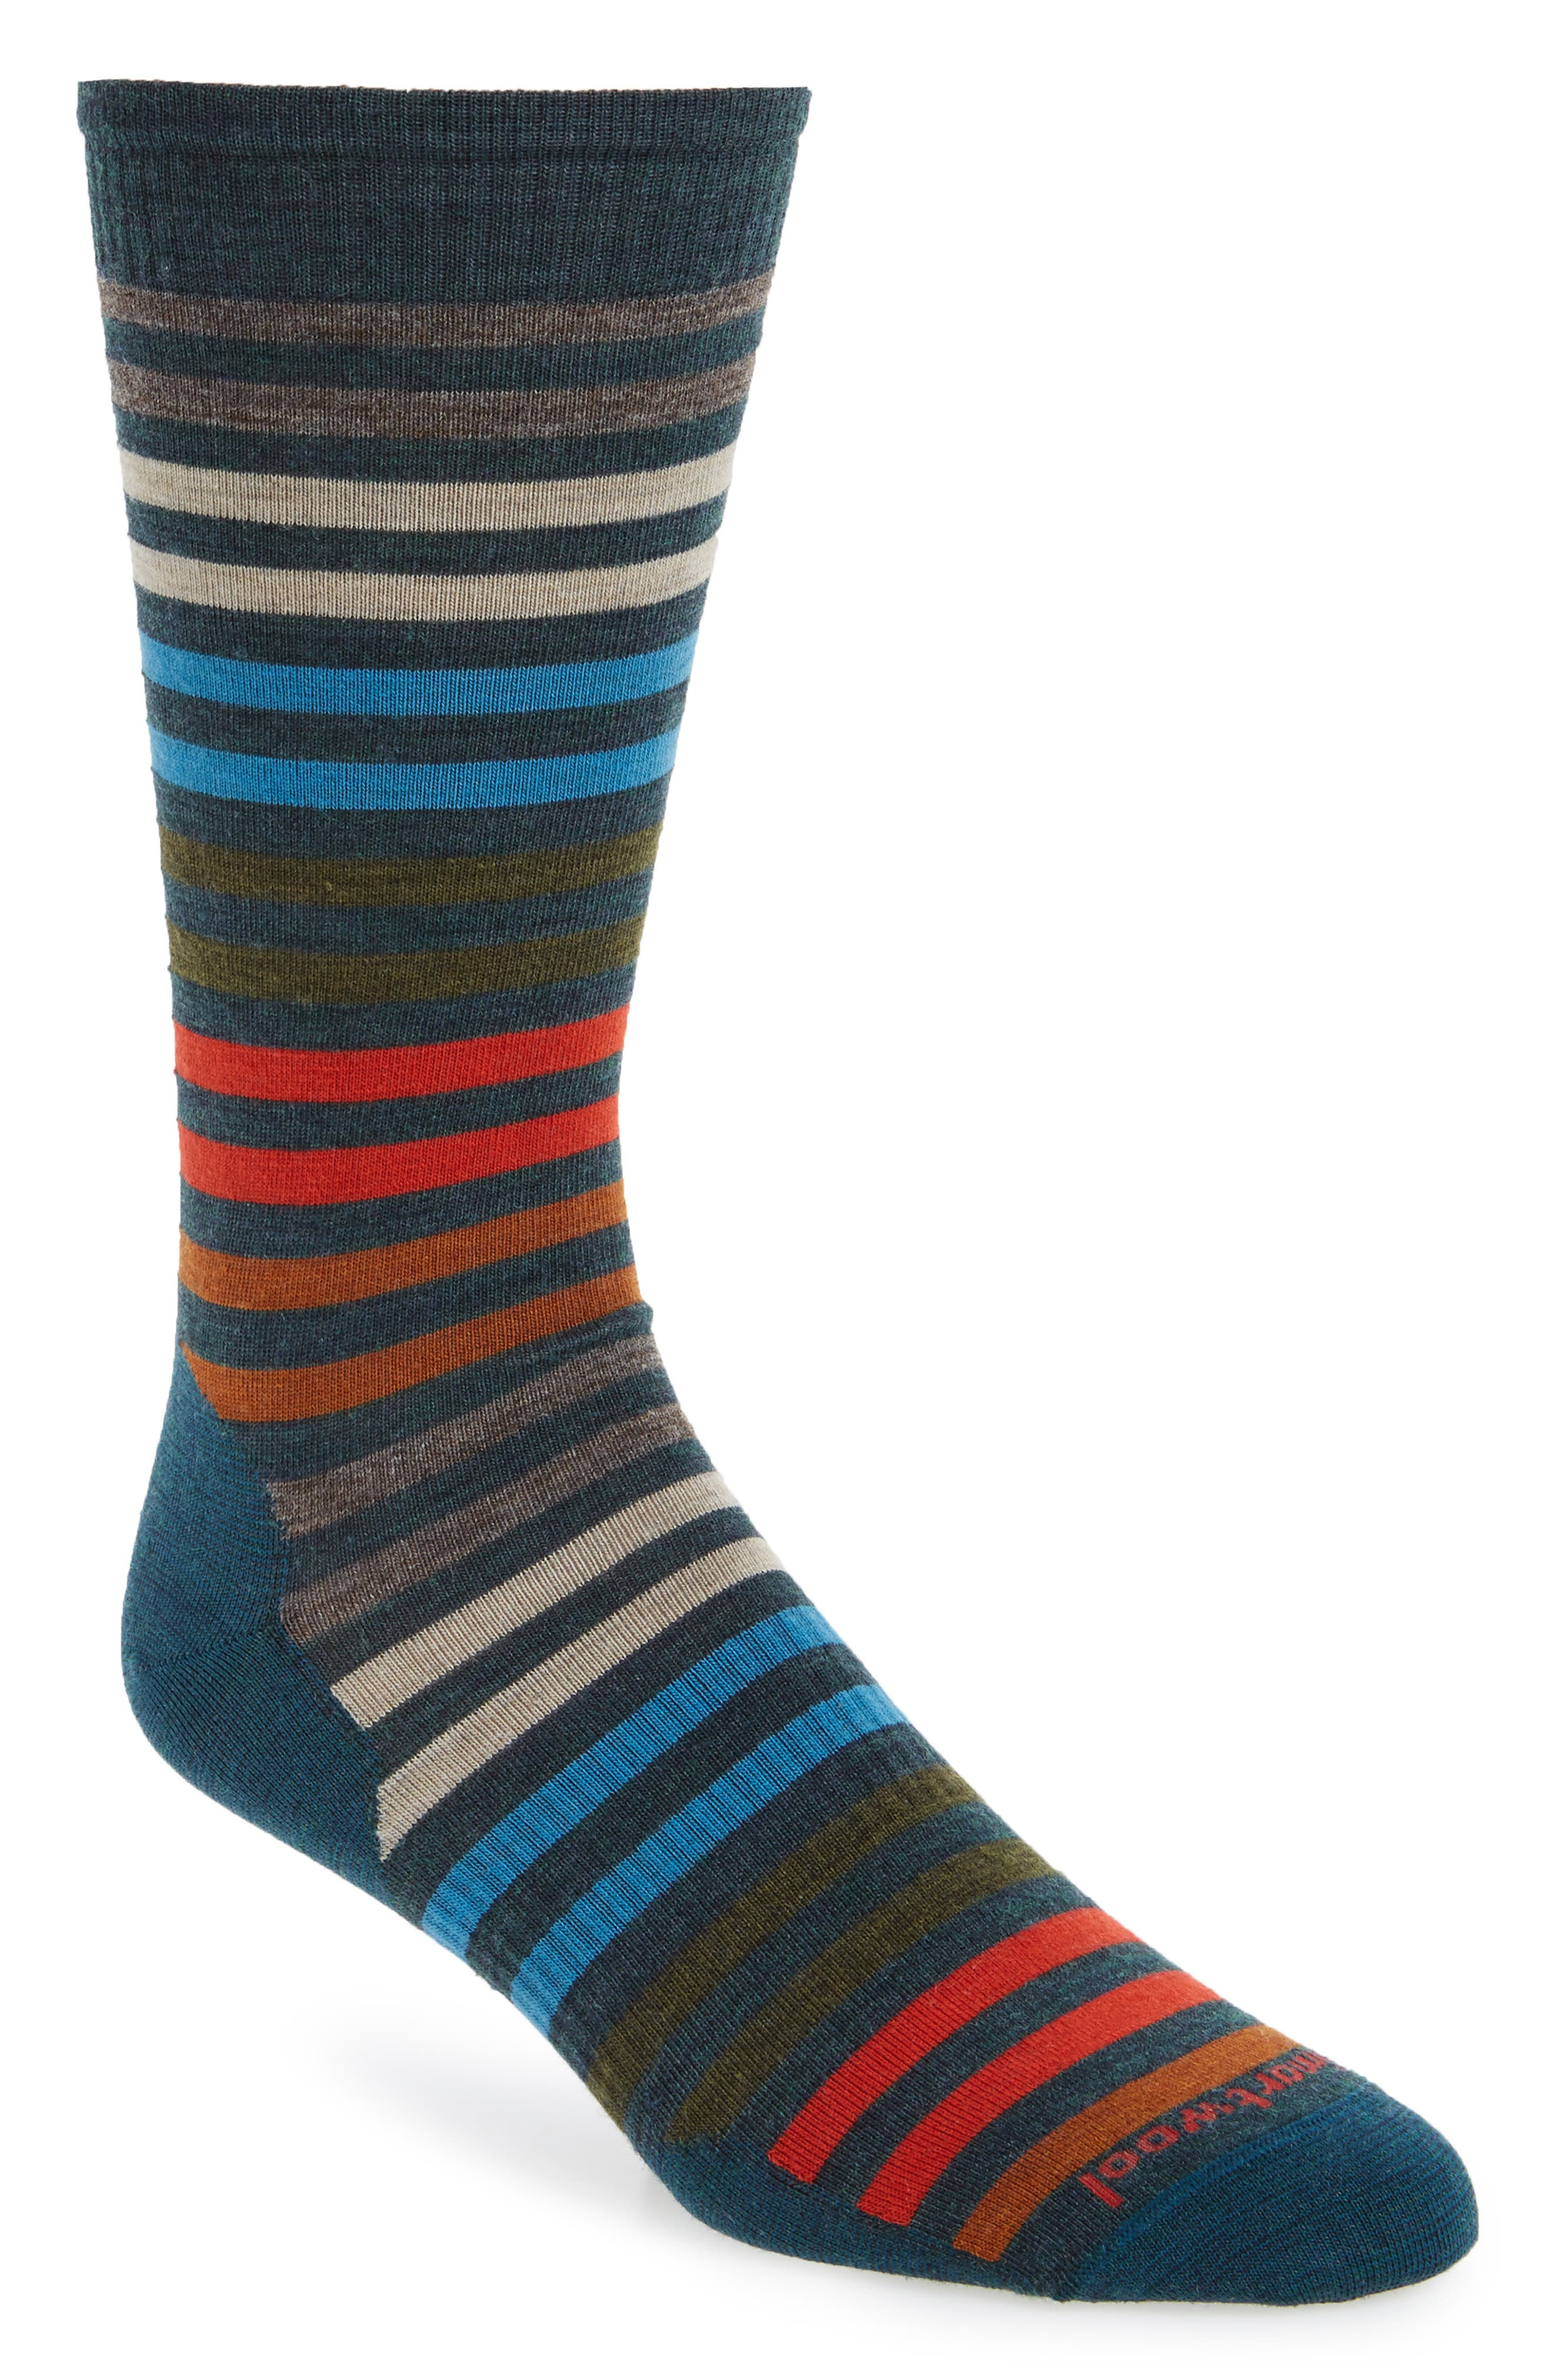 Main Image - Smartwool 'Spruce Street' Stripe Merino Wool Blend Socks